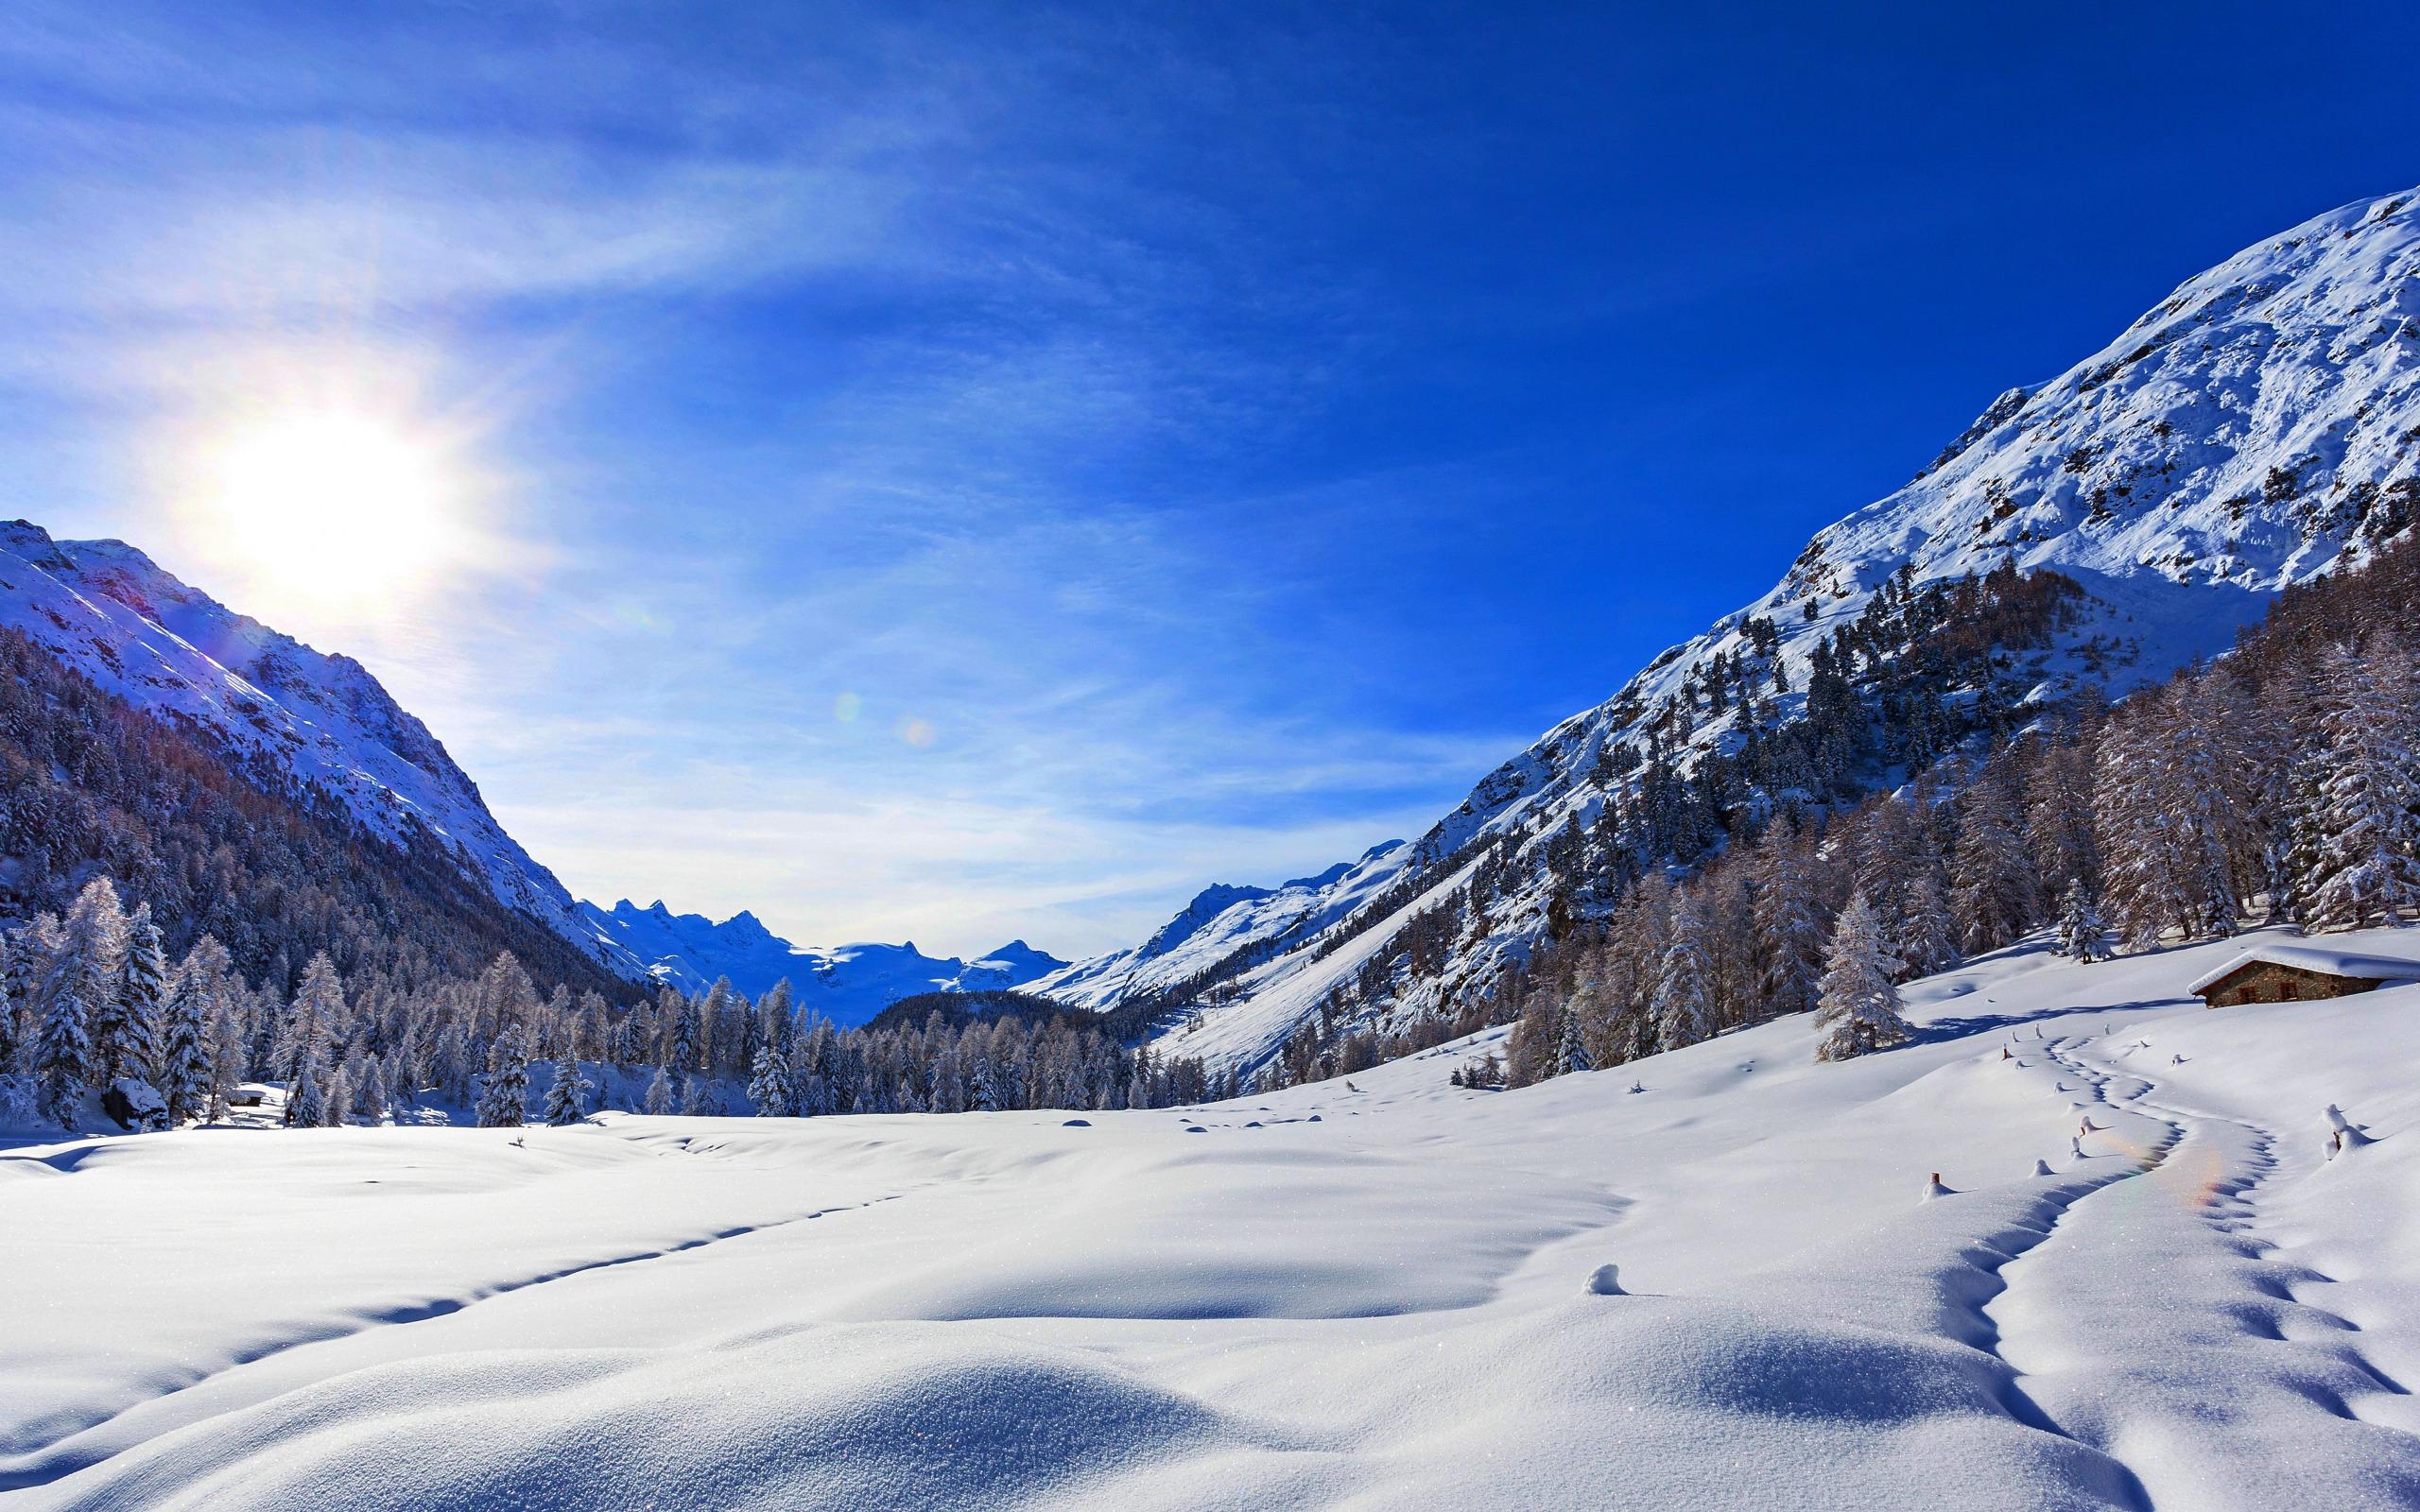 природа скалы деревья горы снег зима nature rock trees mountains snow winter  № 455806 без смс